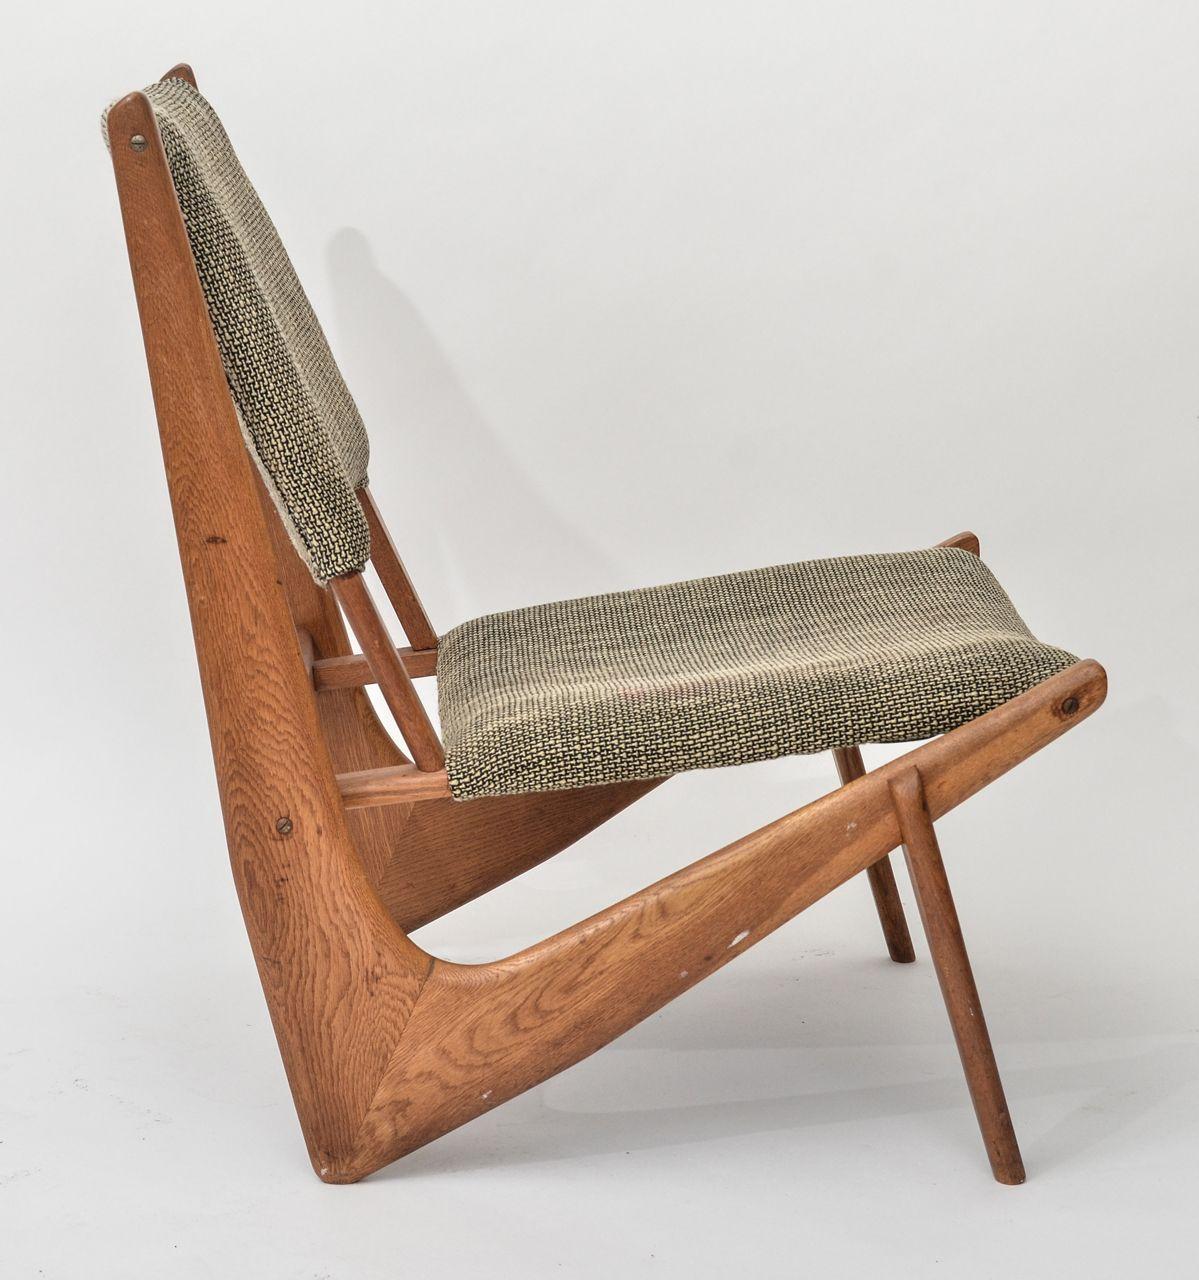 Single Sculptural Chair 1stdibs Com Sculptural Chair Scandinavian Chairs Outdoor Lounge Chair Cushions